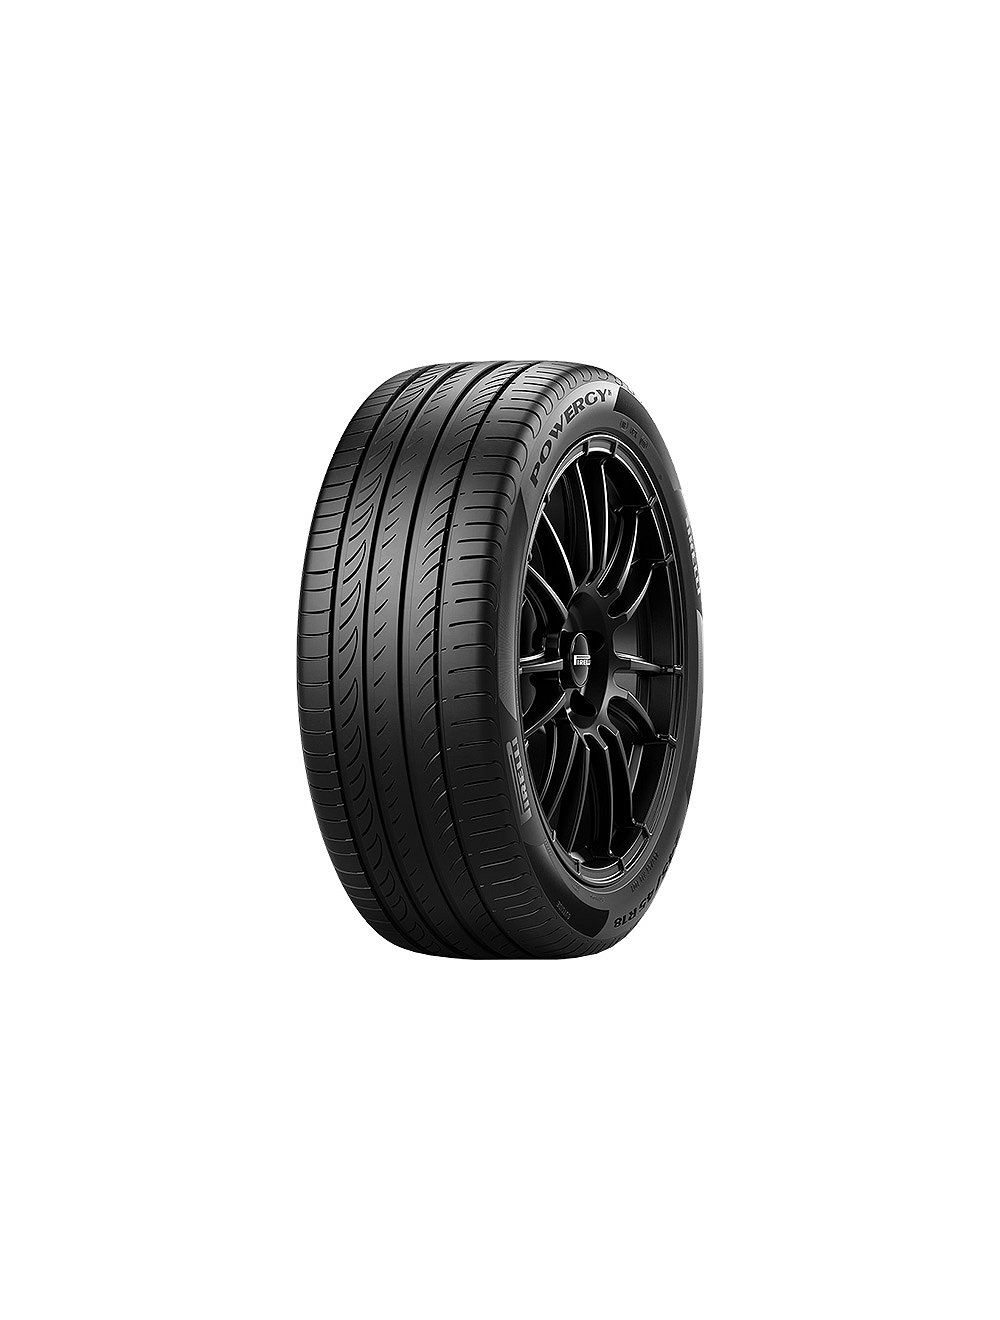 Pirelli 255/35R20 Y Powergy XL Nyári gumi